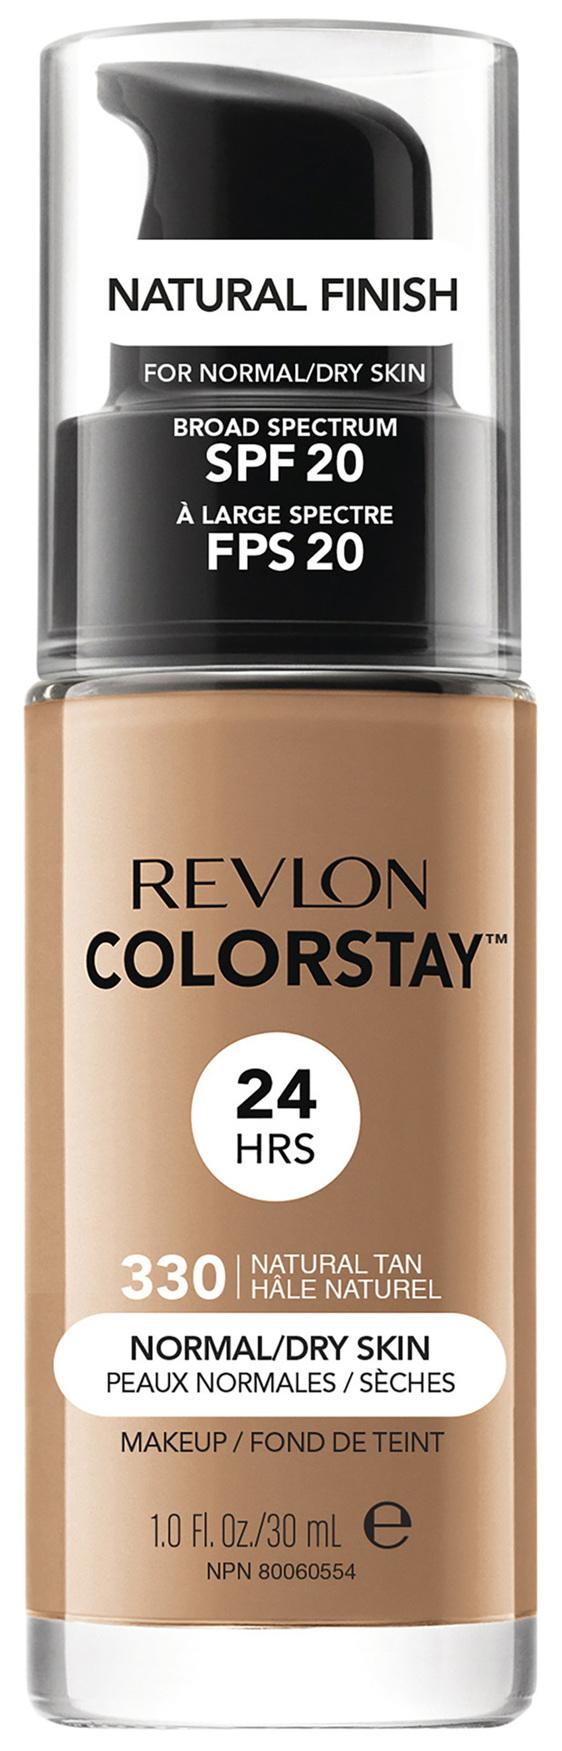 Revlon Colorstay™ Makeup For Normal/Dry Skin Natural Tan